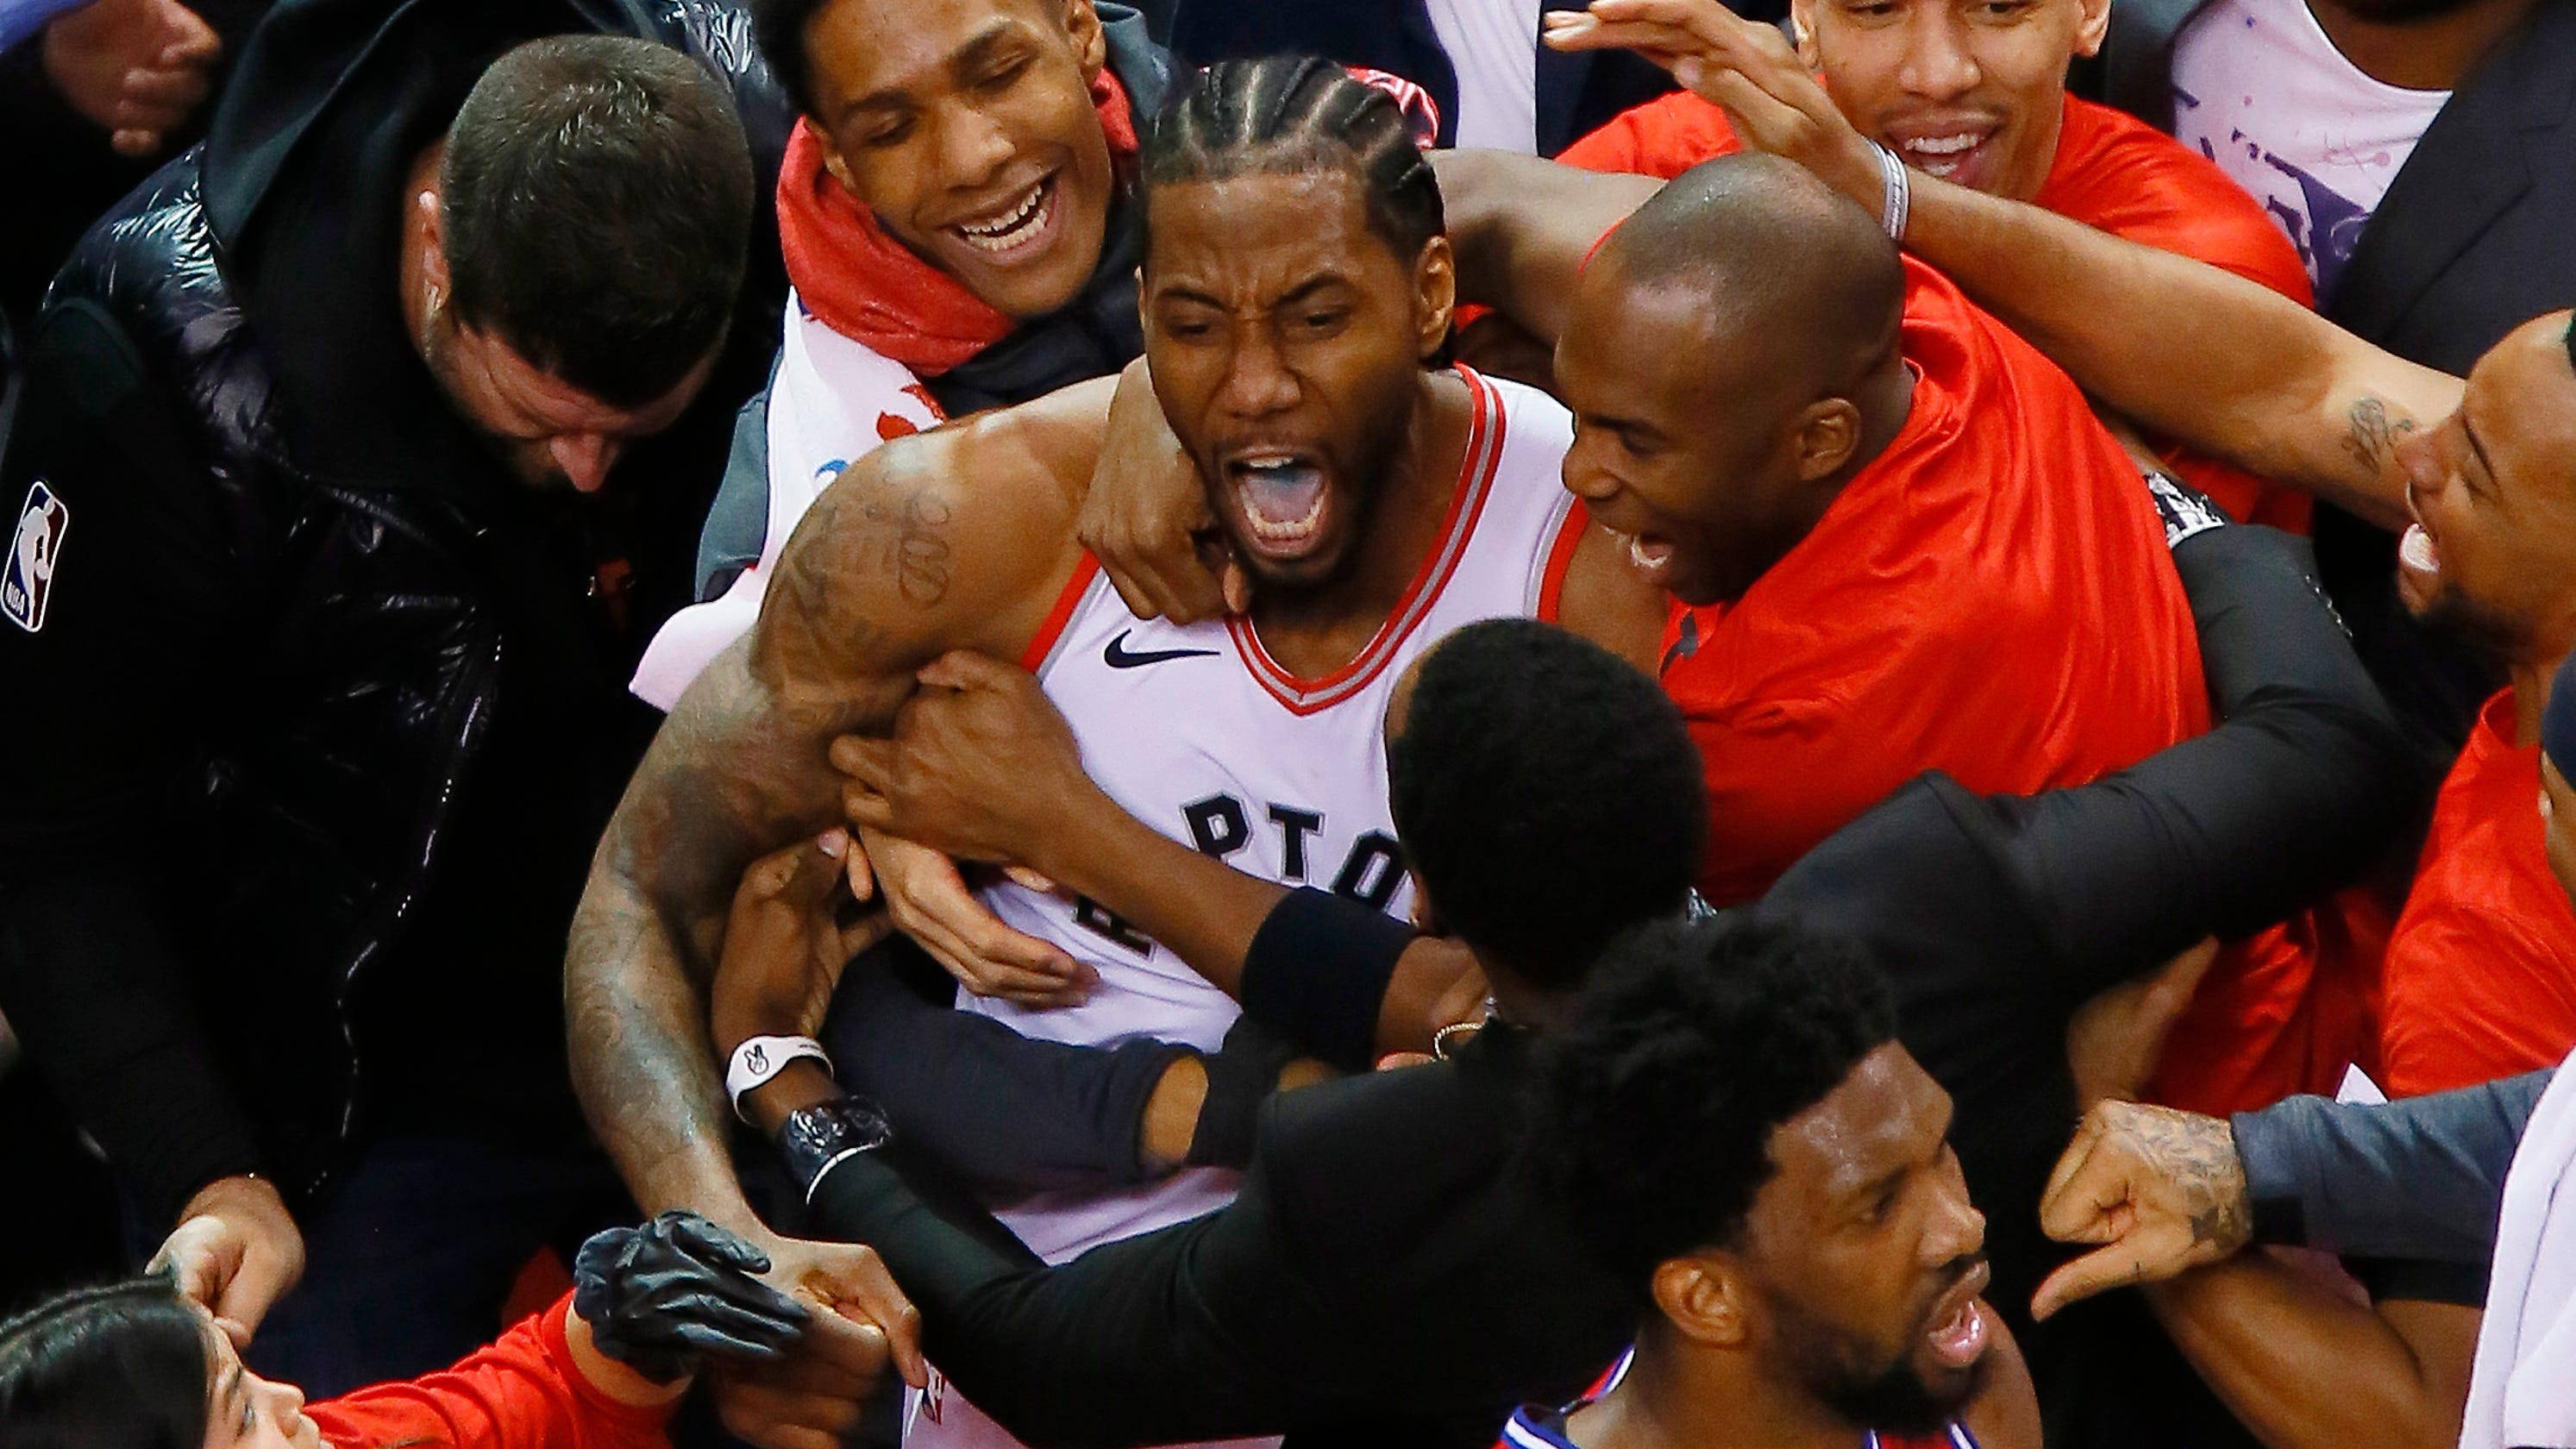 NBA Playoffs: Kawhi Leonard Buzzer-beater Sends Raptors To